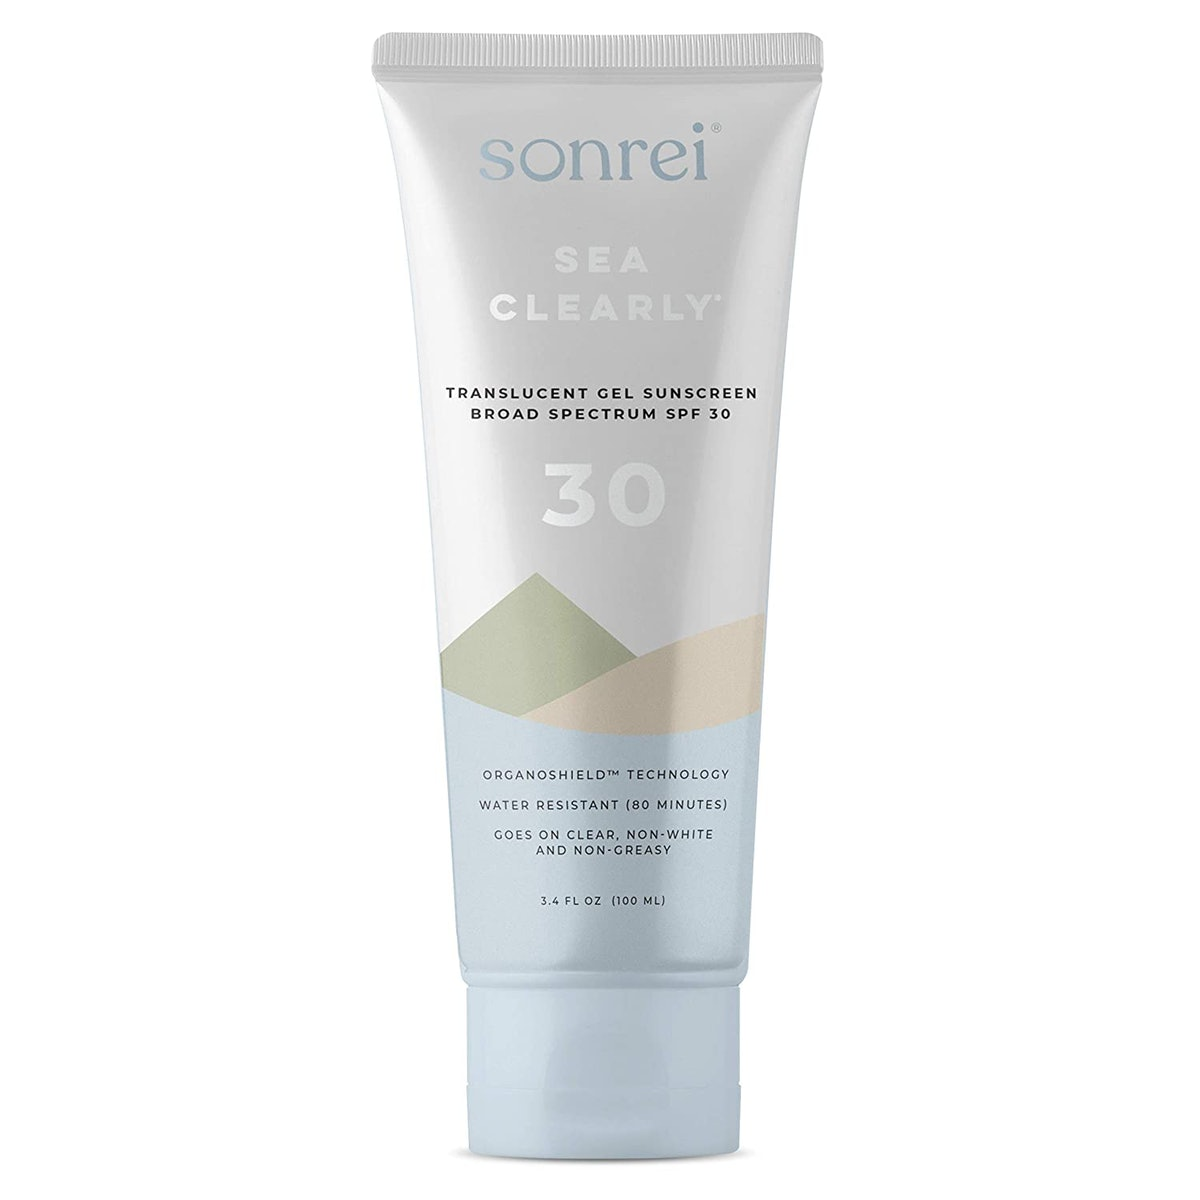 Sonrei Sea Clearly Translucent Gel Sunscreen